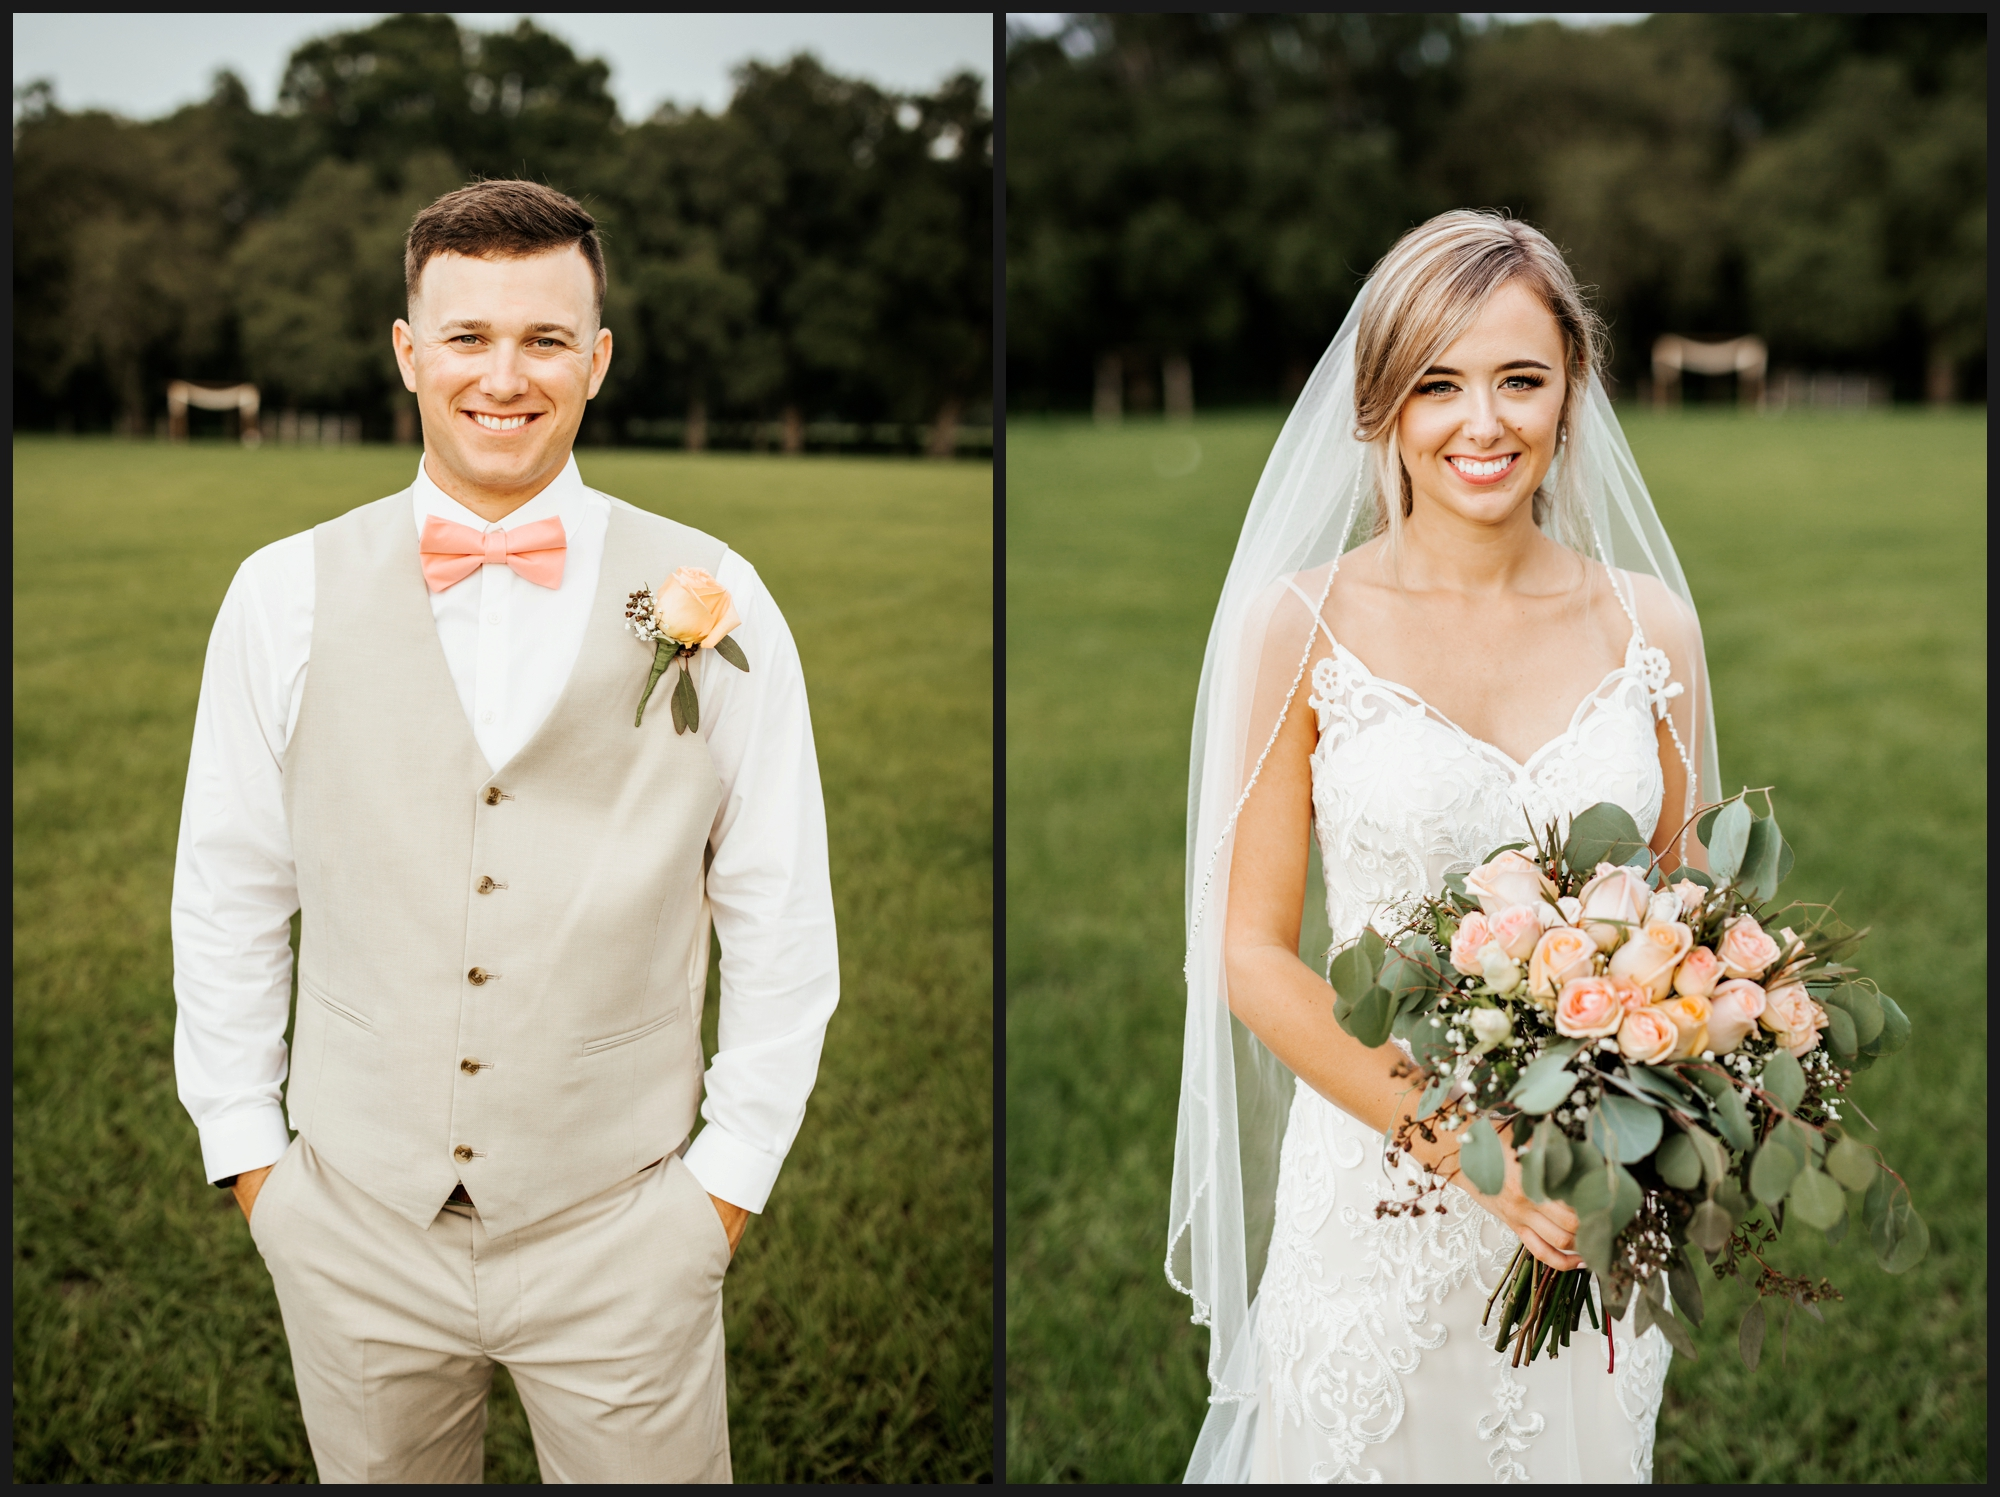 Orlando-Wedding-Photographer-destination-wedding-photographer-florida-wedding-photographer-hawaii-wedding-photographer_0266.jpg